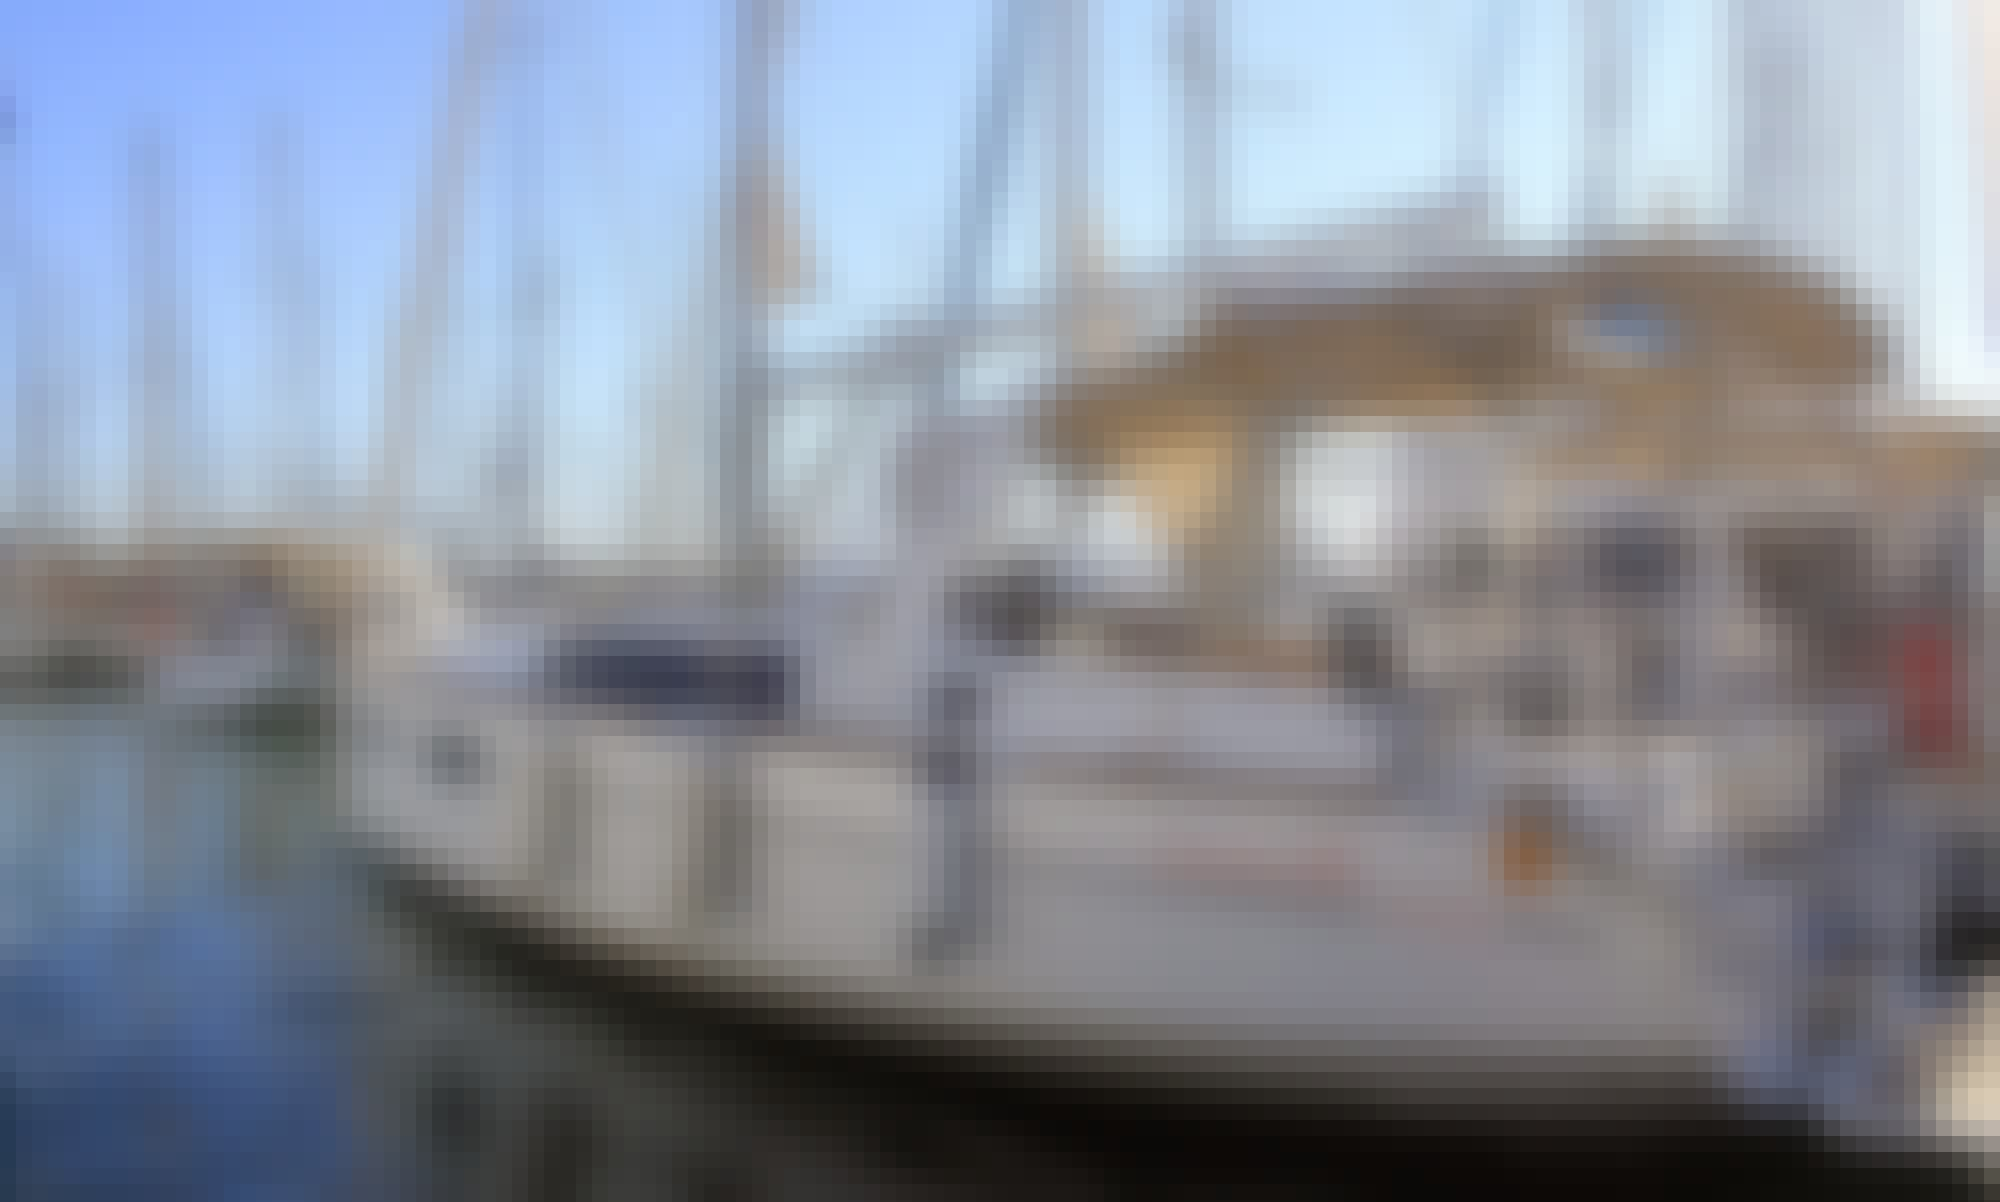 Charter the Brandnew 2020 Oceanis 35.1 Sailing Yacht in Barcelona, Spain!